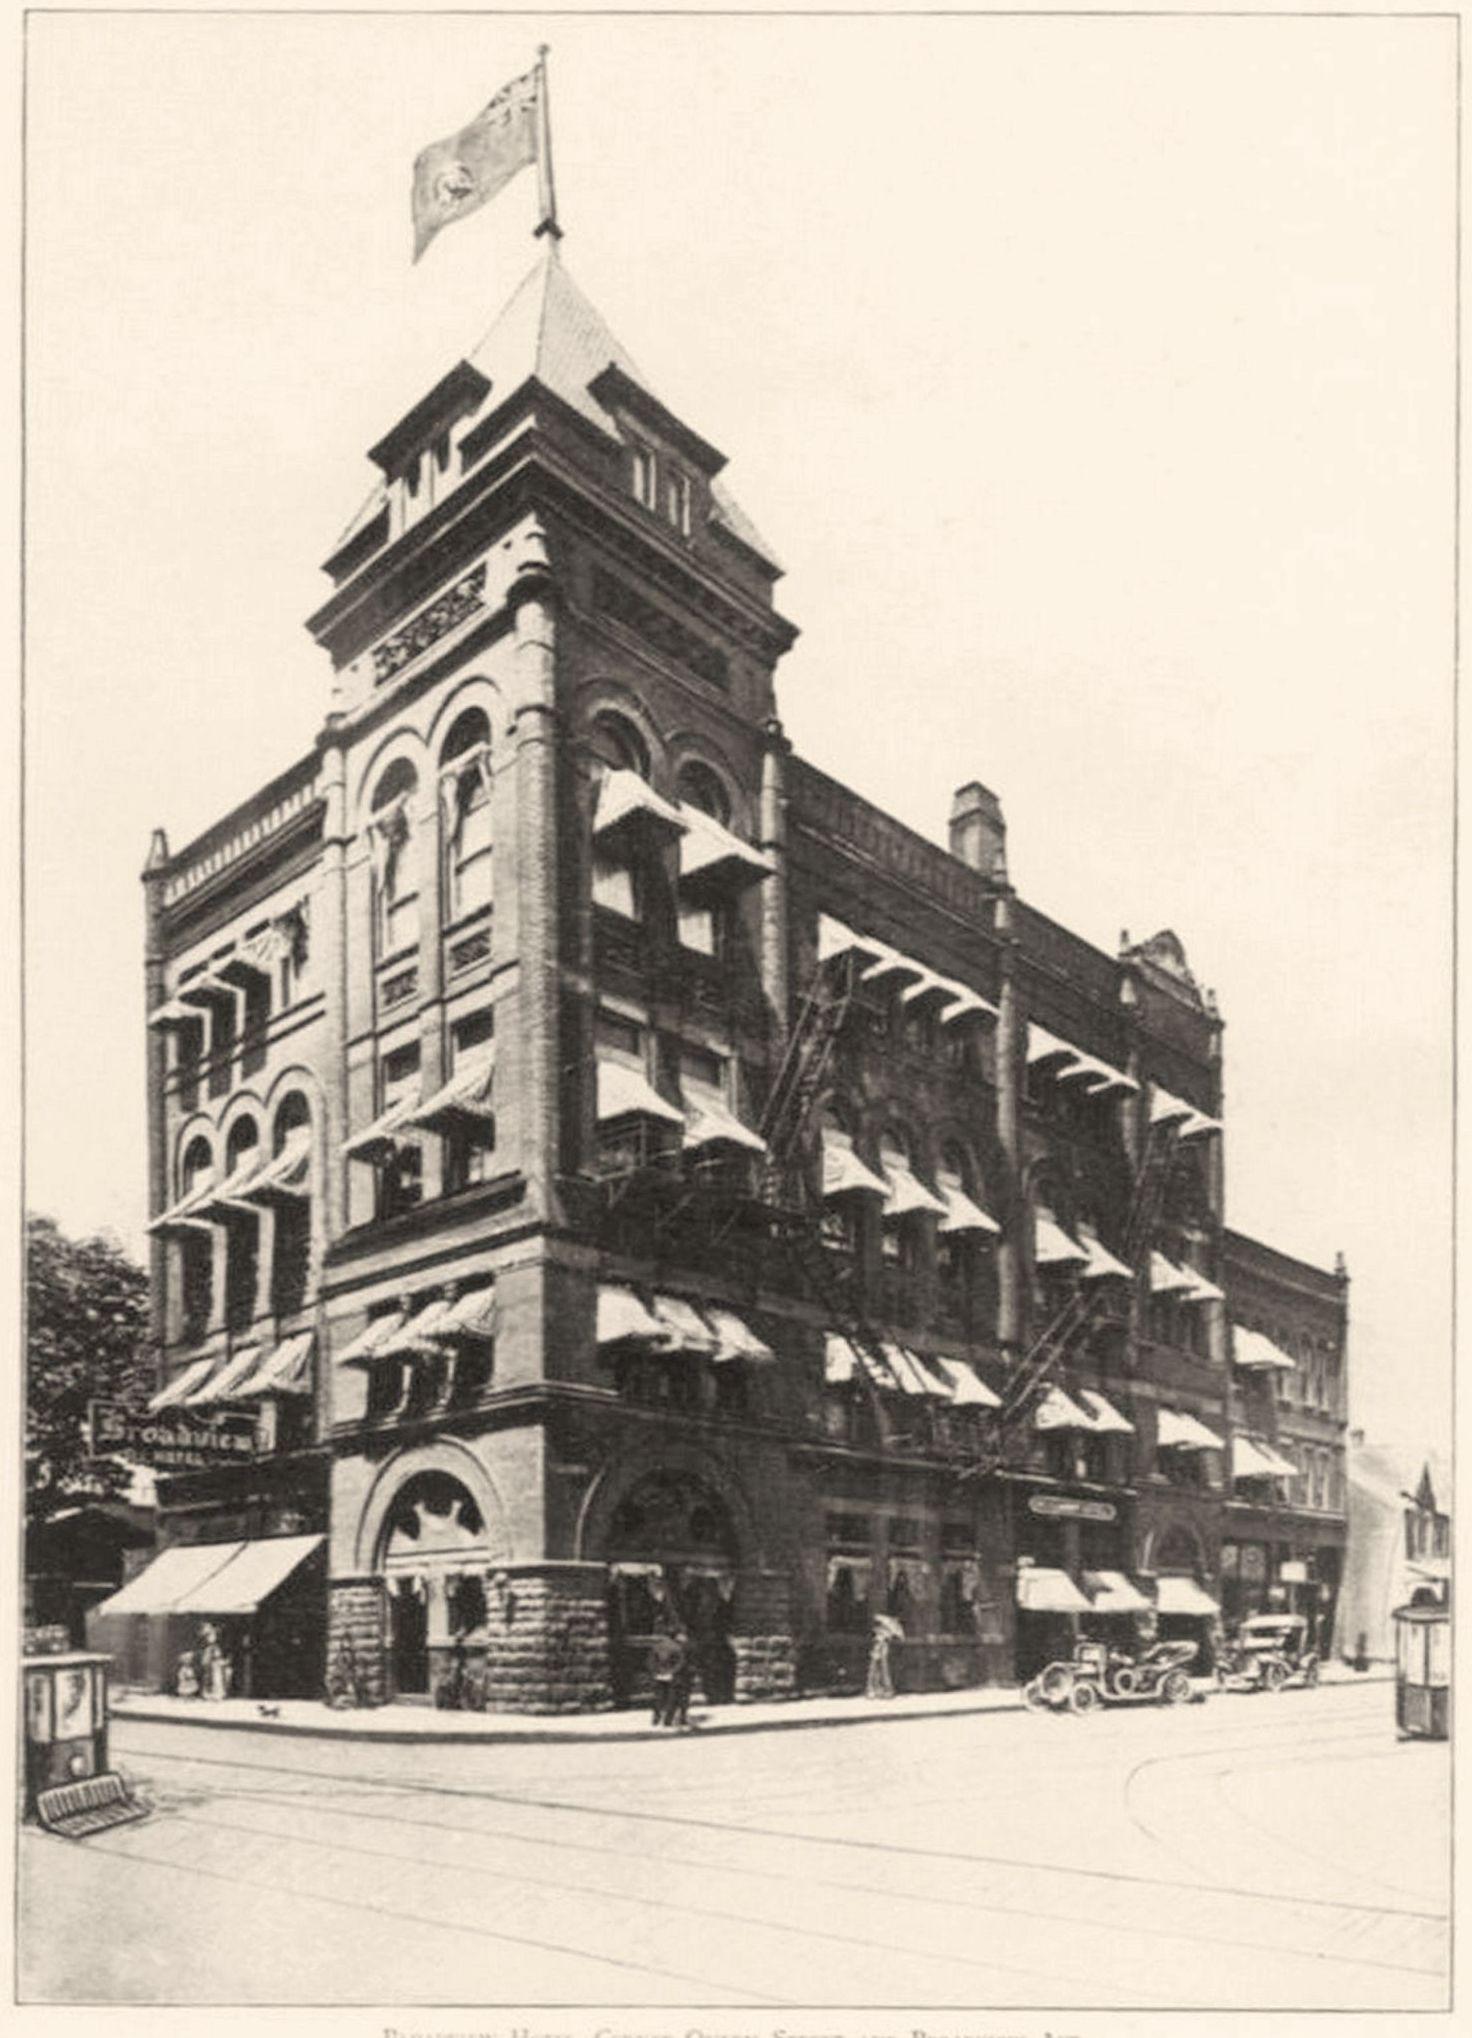 Toronto, Canada's Queen City 1912 Broadview Hotel